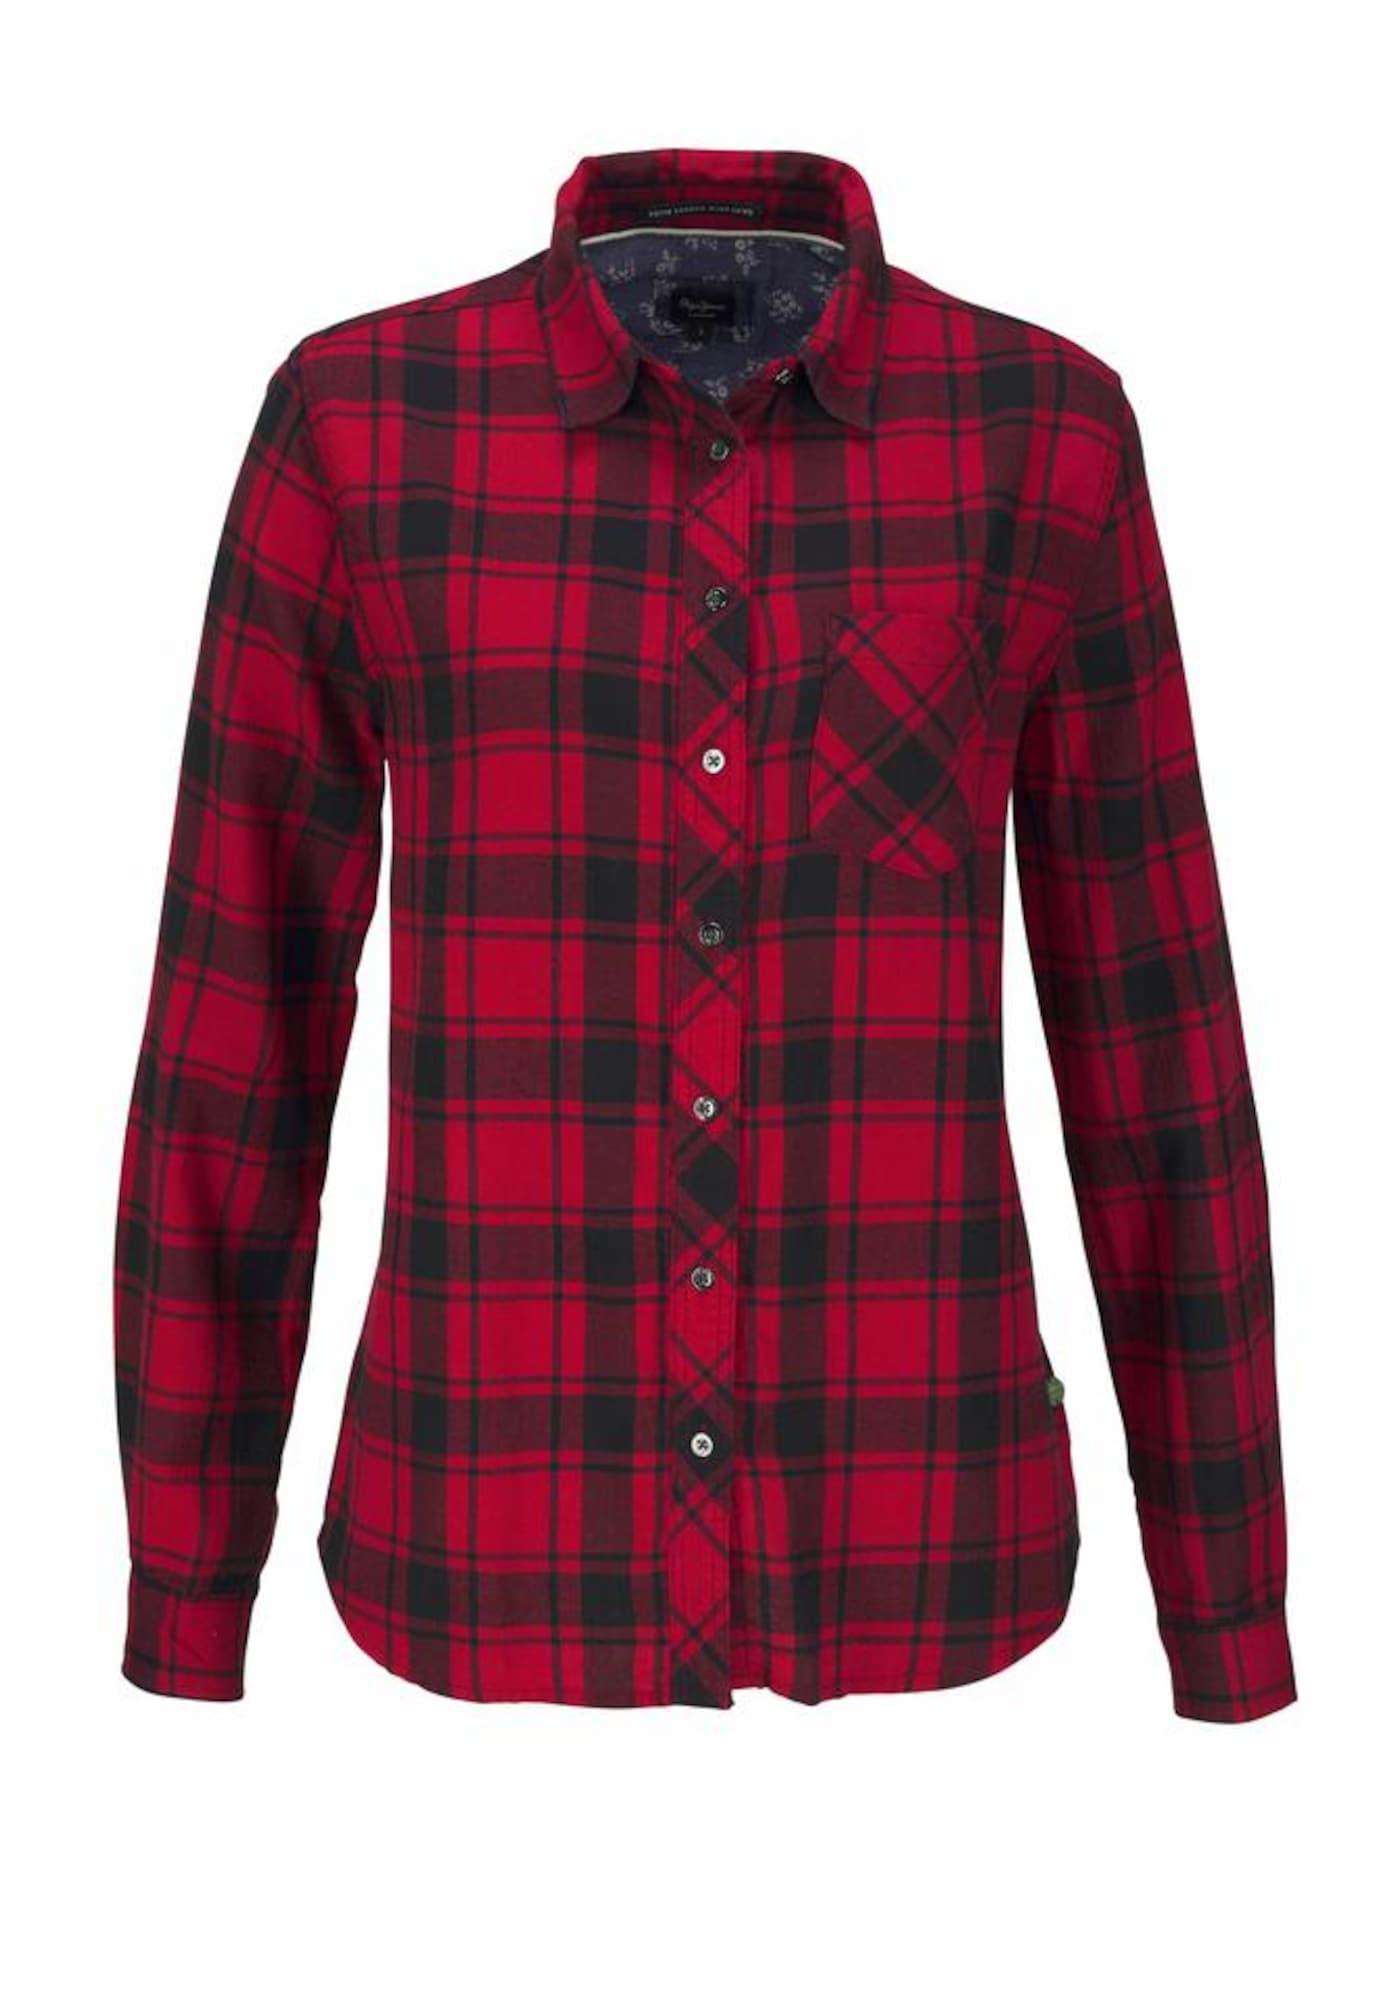 Pepe Jeans Dames Blouse KAREN rood zwart